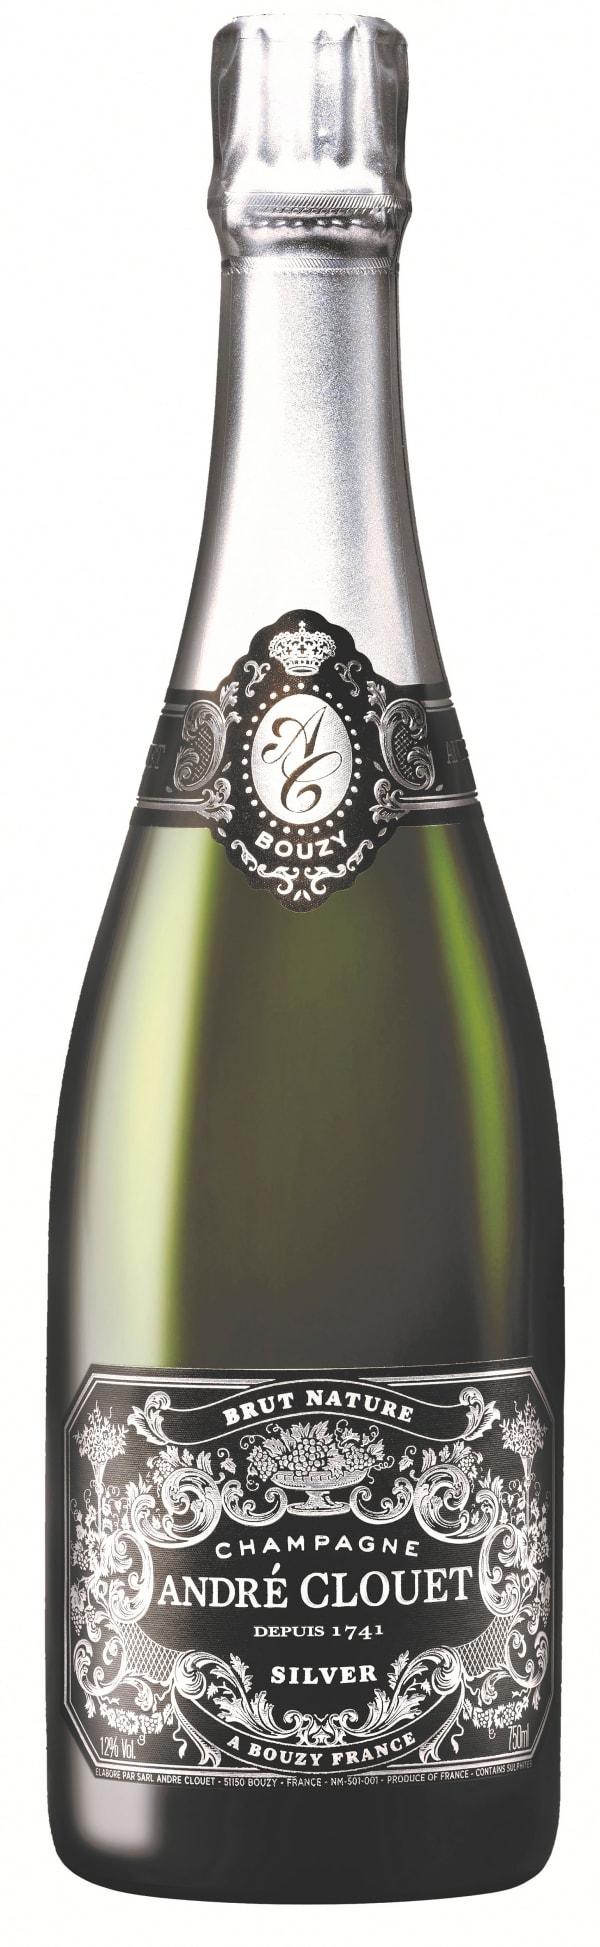 André Clouet Silver Champagne Brut Nature